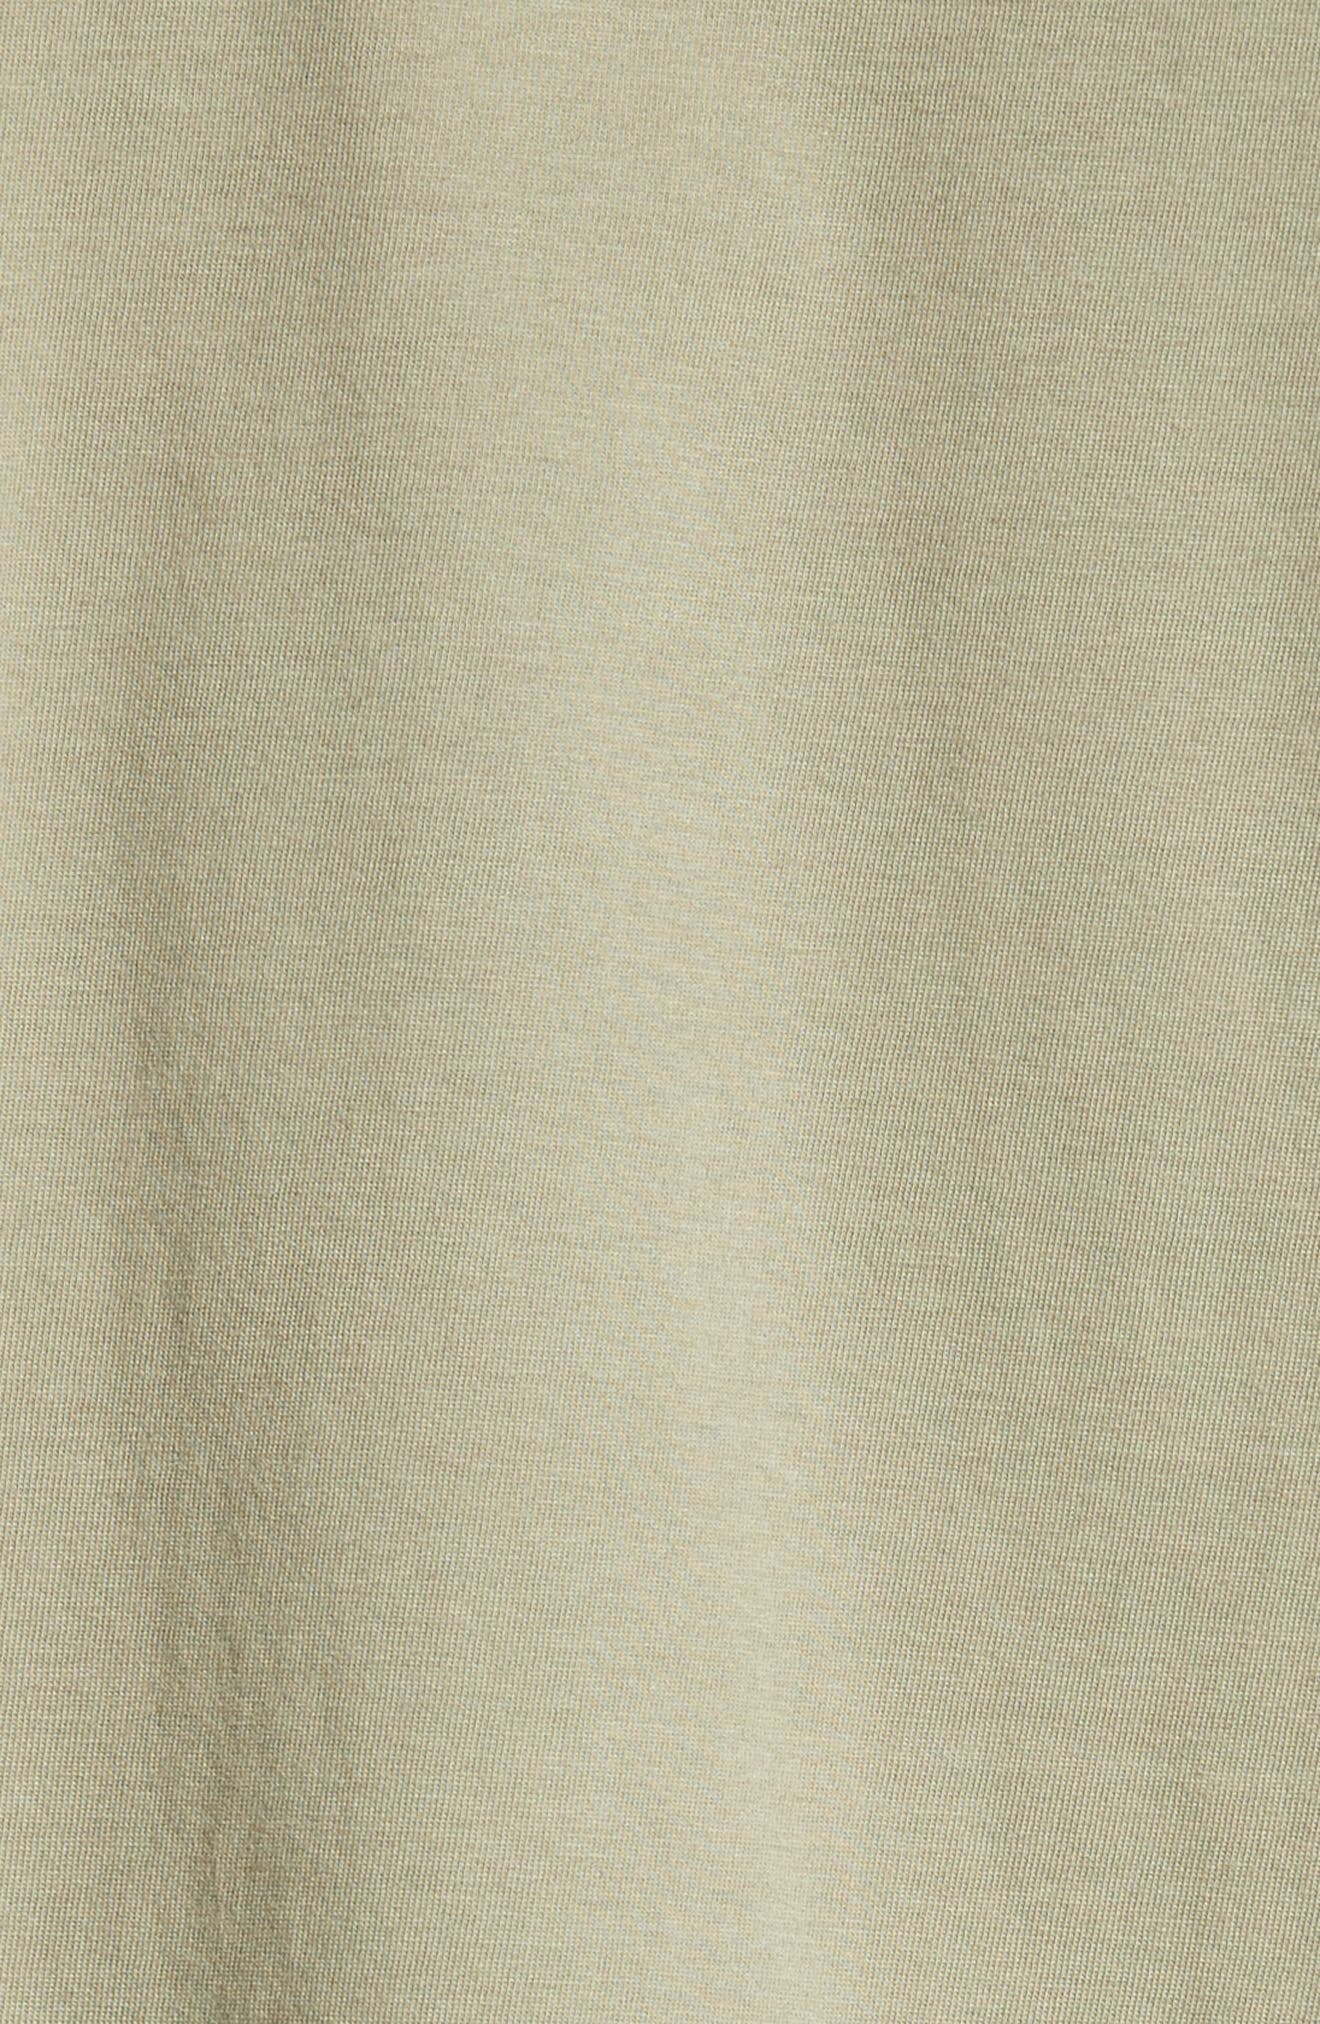 Miller T-Shirt,                             Alternate thumbnail 5, color,                             Sage